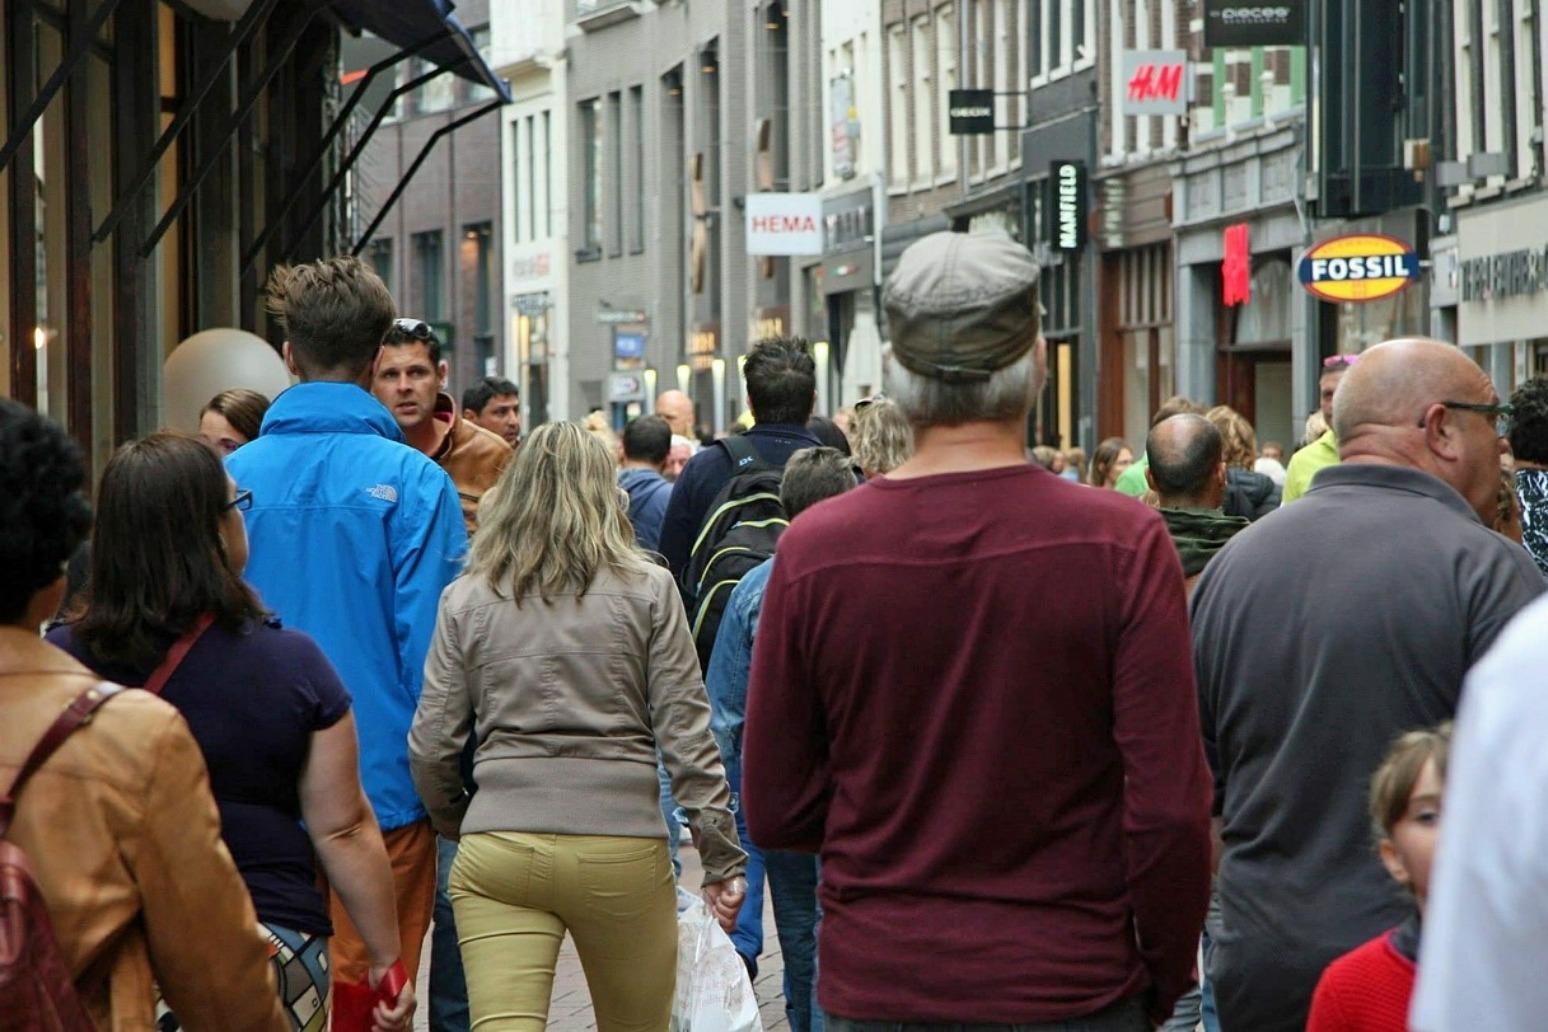 Thousands of jobs at risk as Debenhams announces plans to close stores